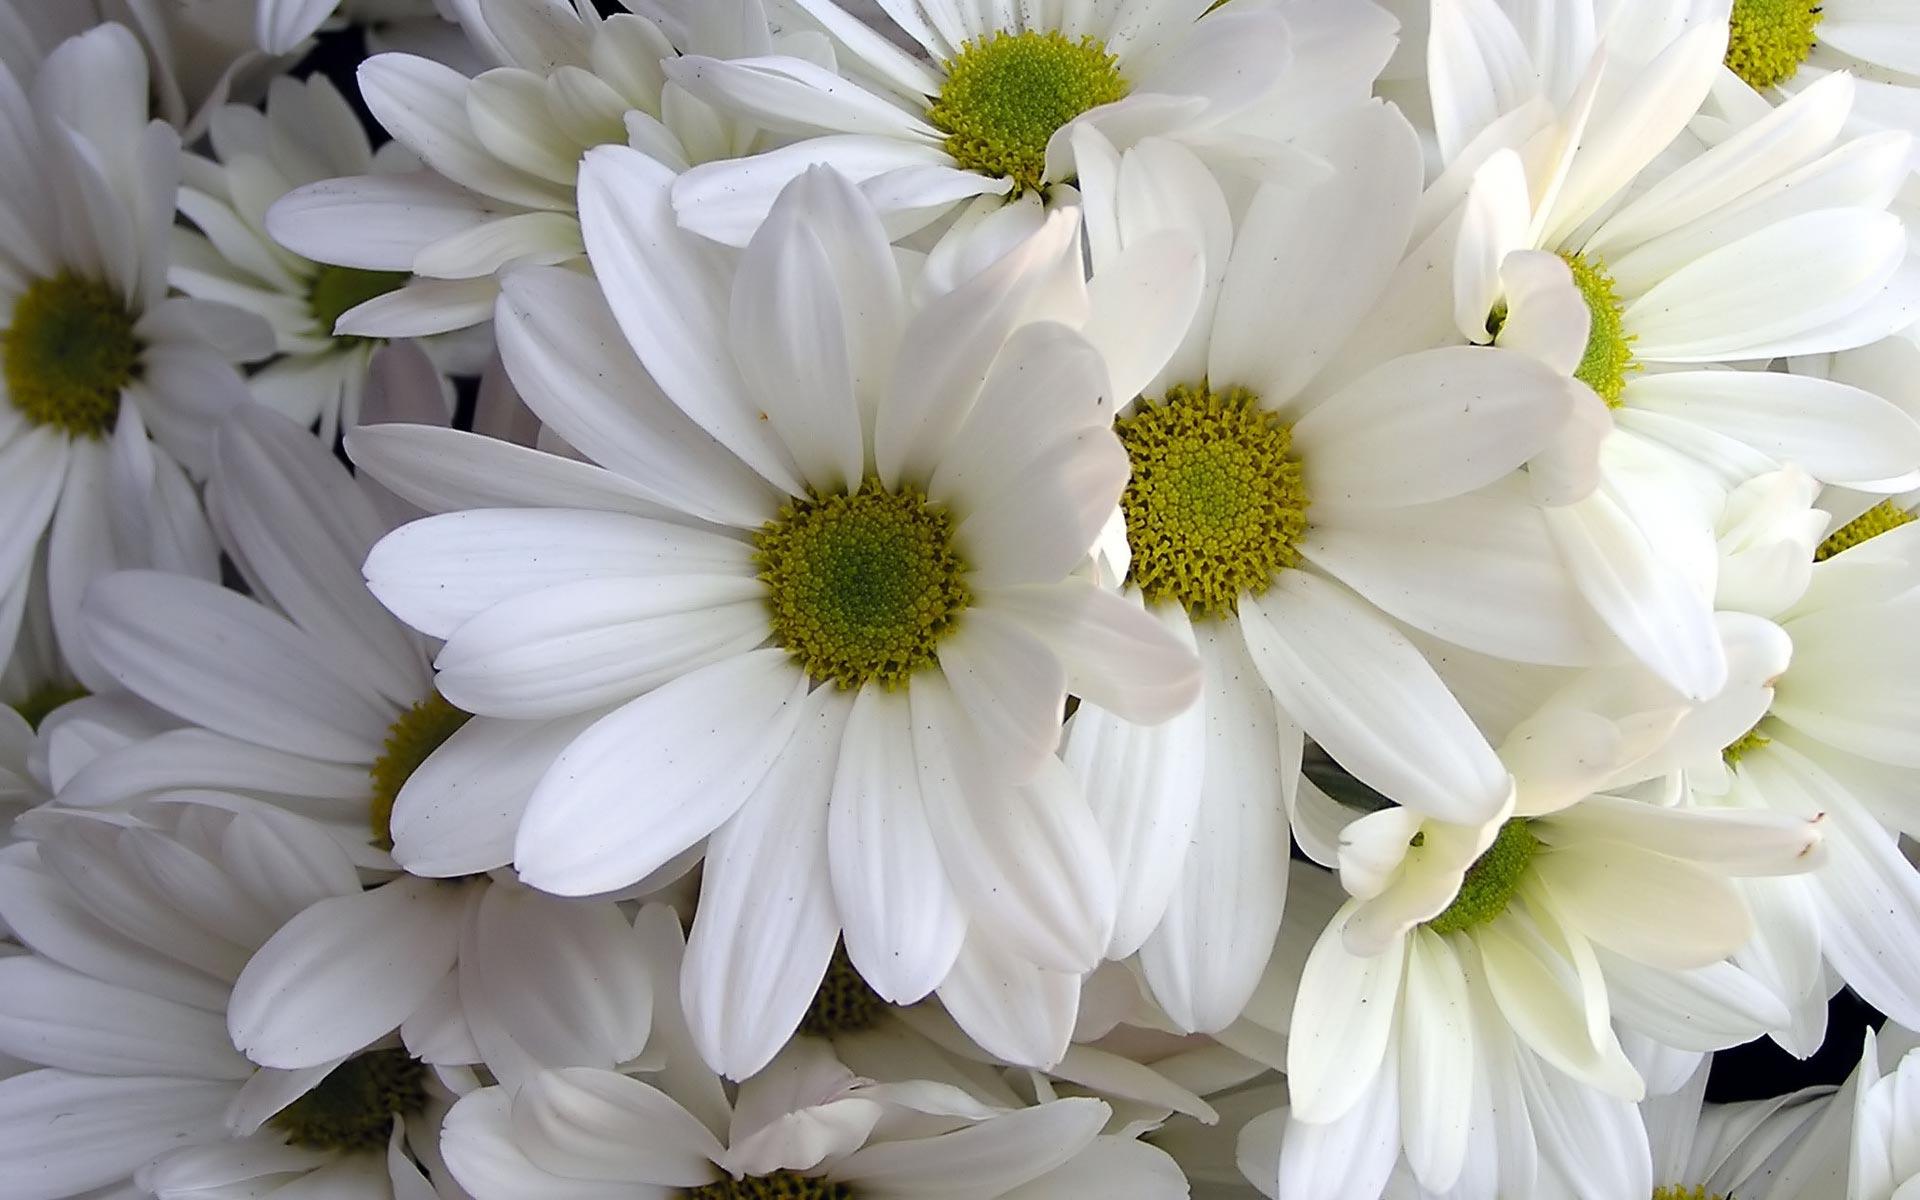 daisies 19748